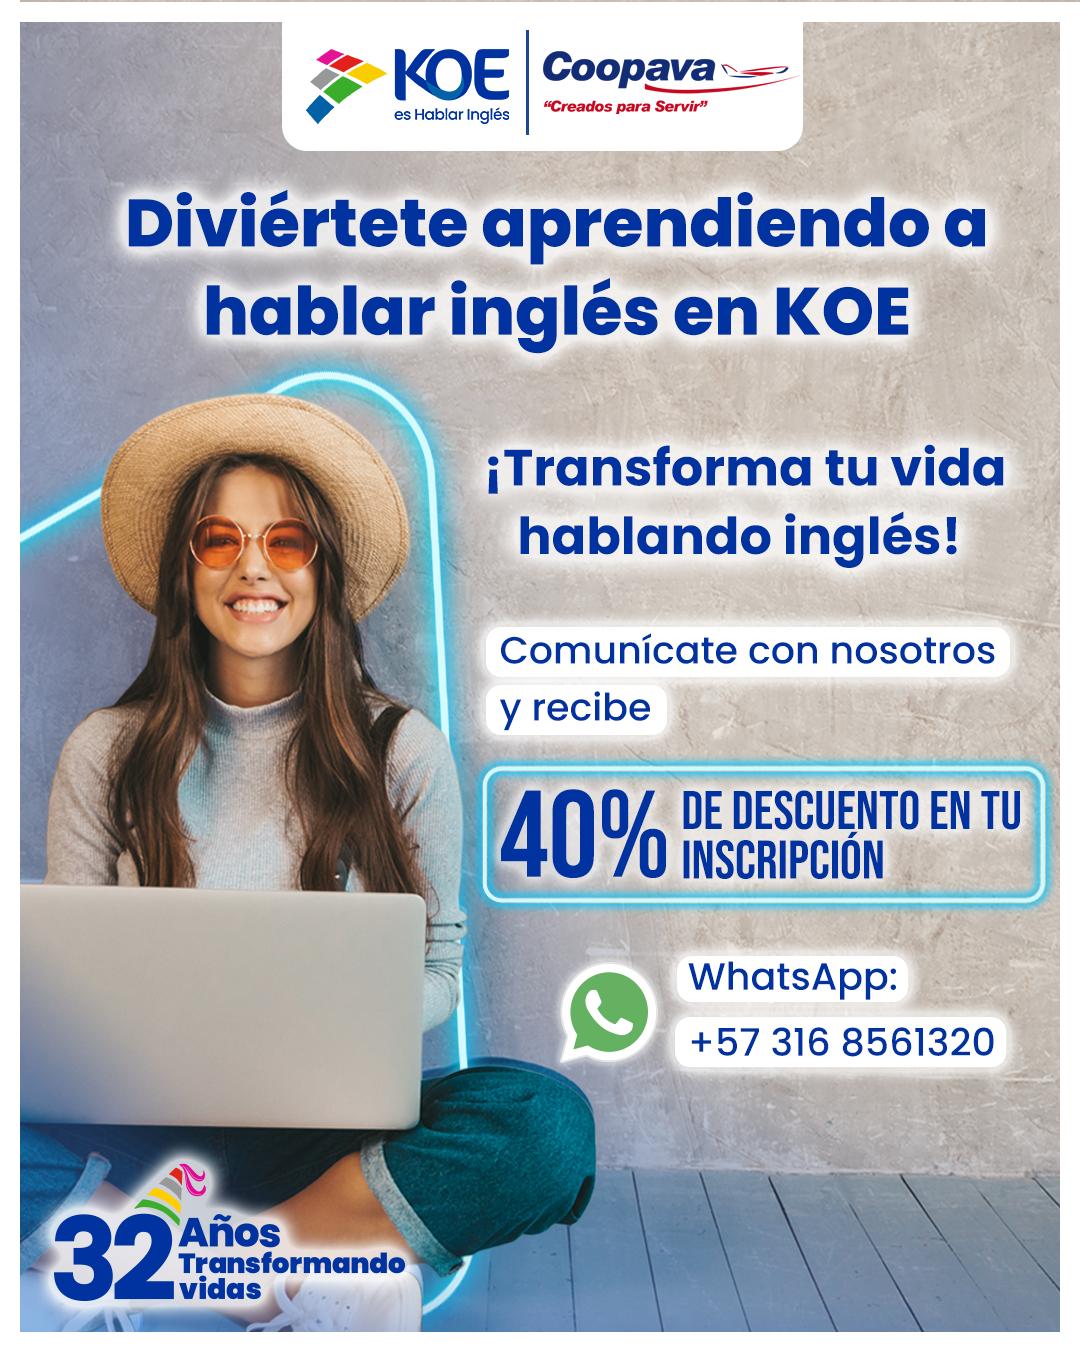 KOE es hablar inglés- Banner Coopava web.png (1.78 MB)